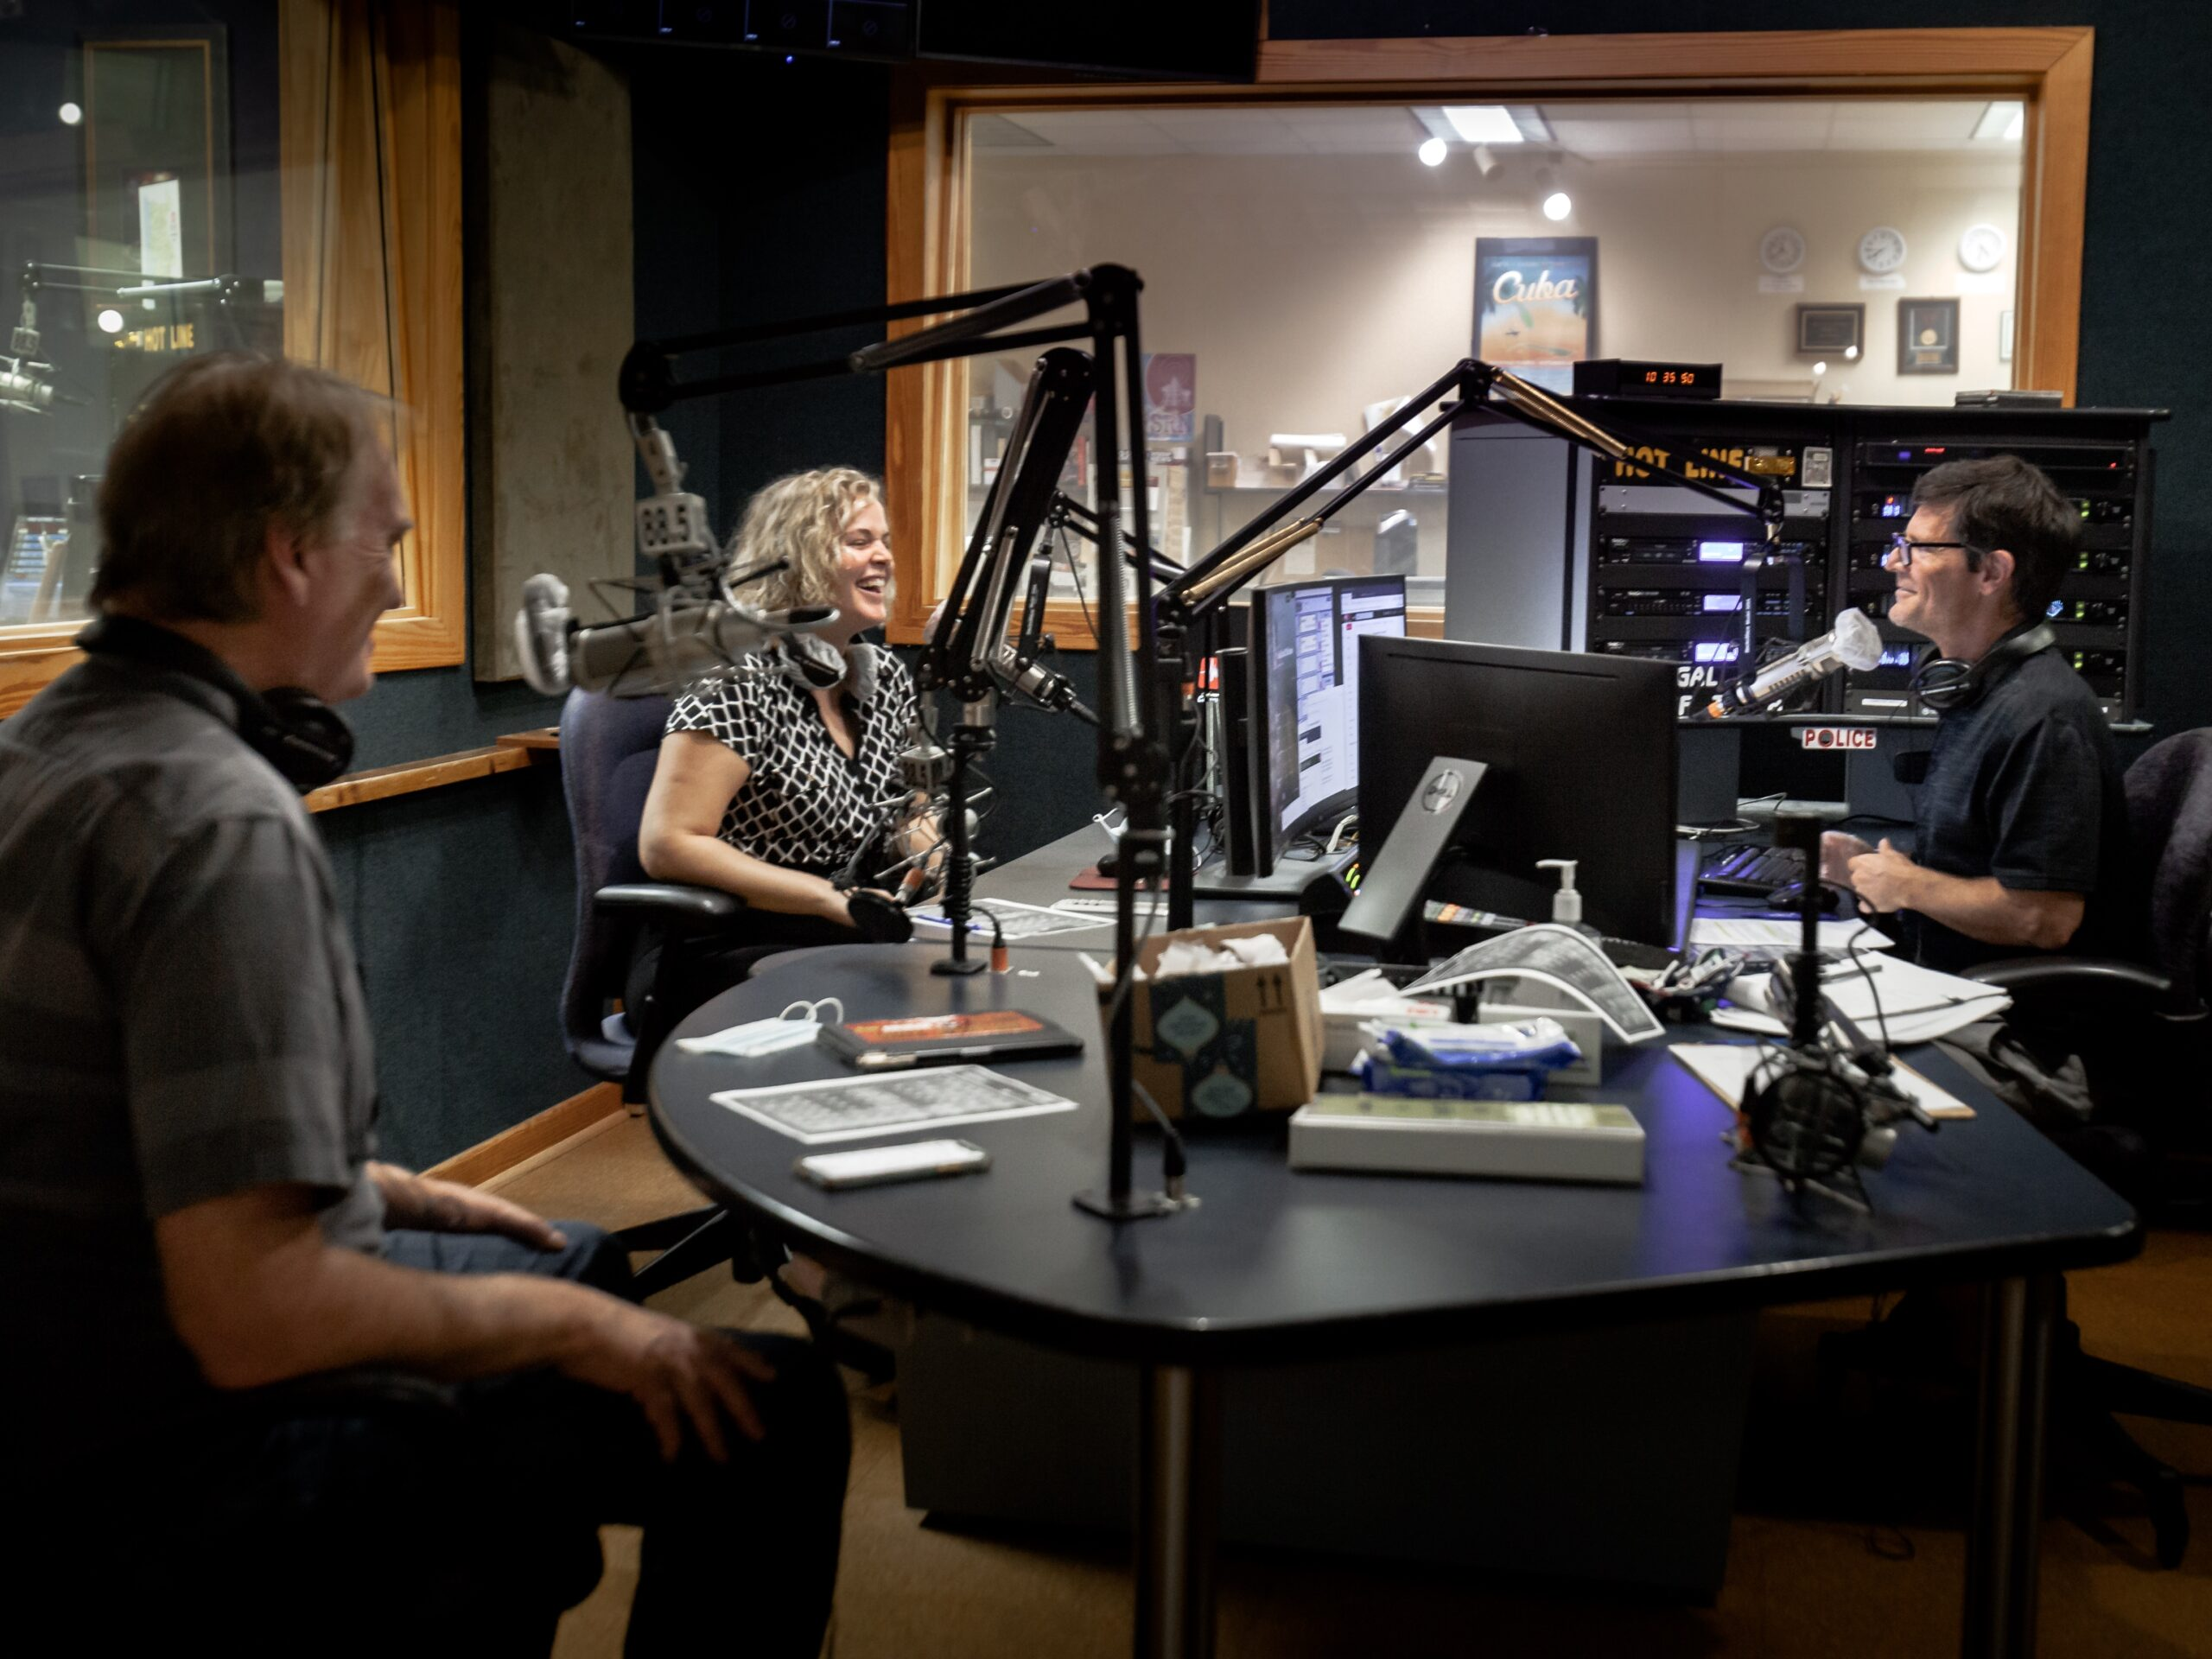 Randy, Sam, and Seán discuss the 2021 program changes